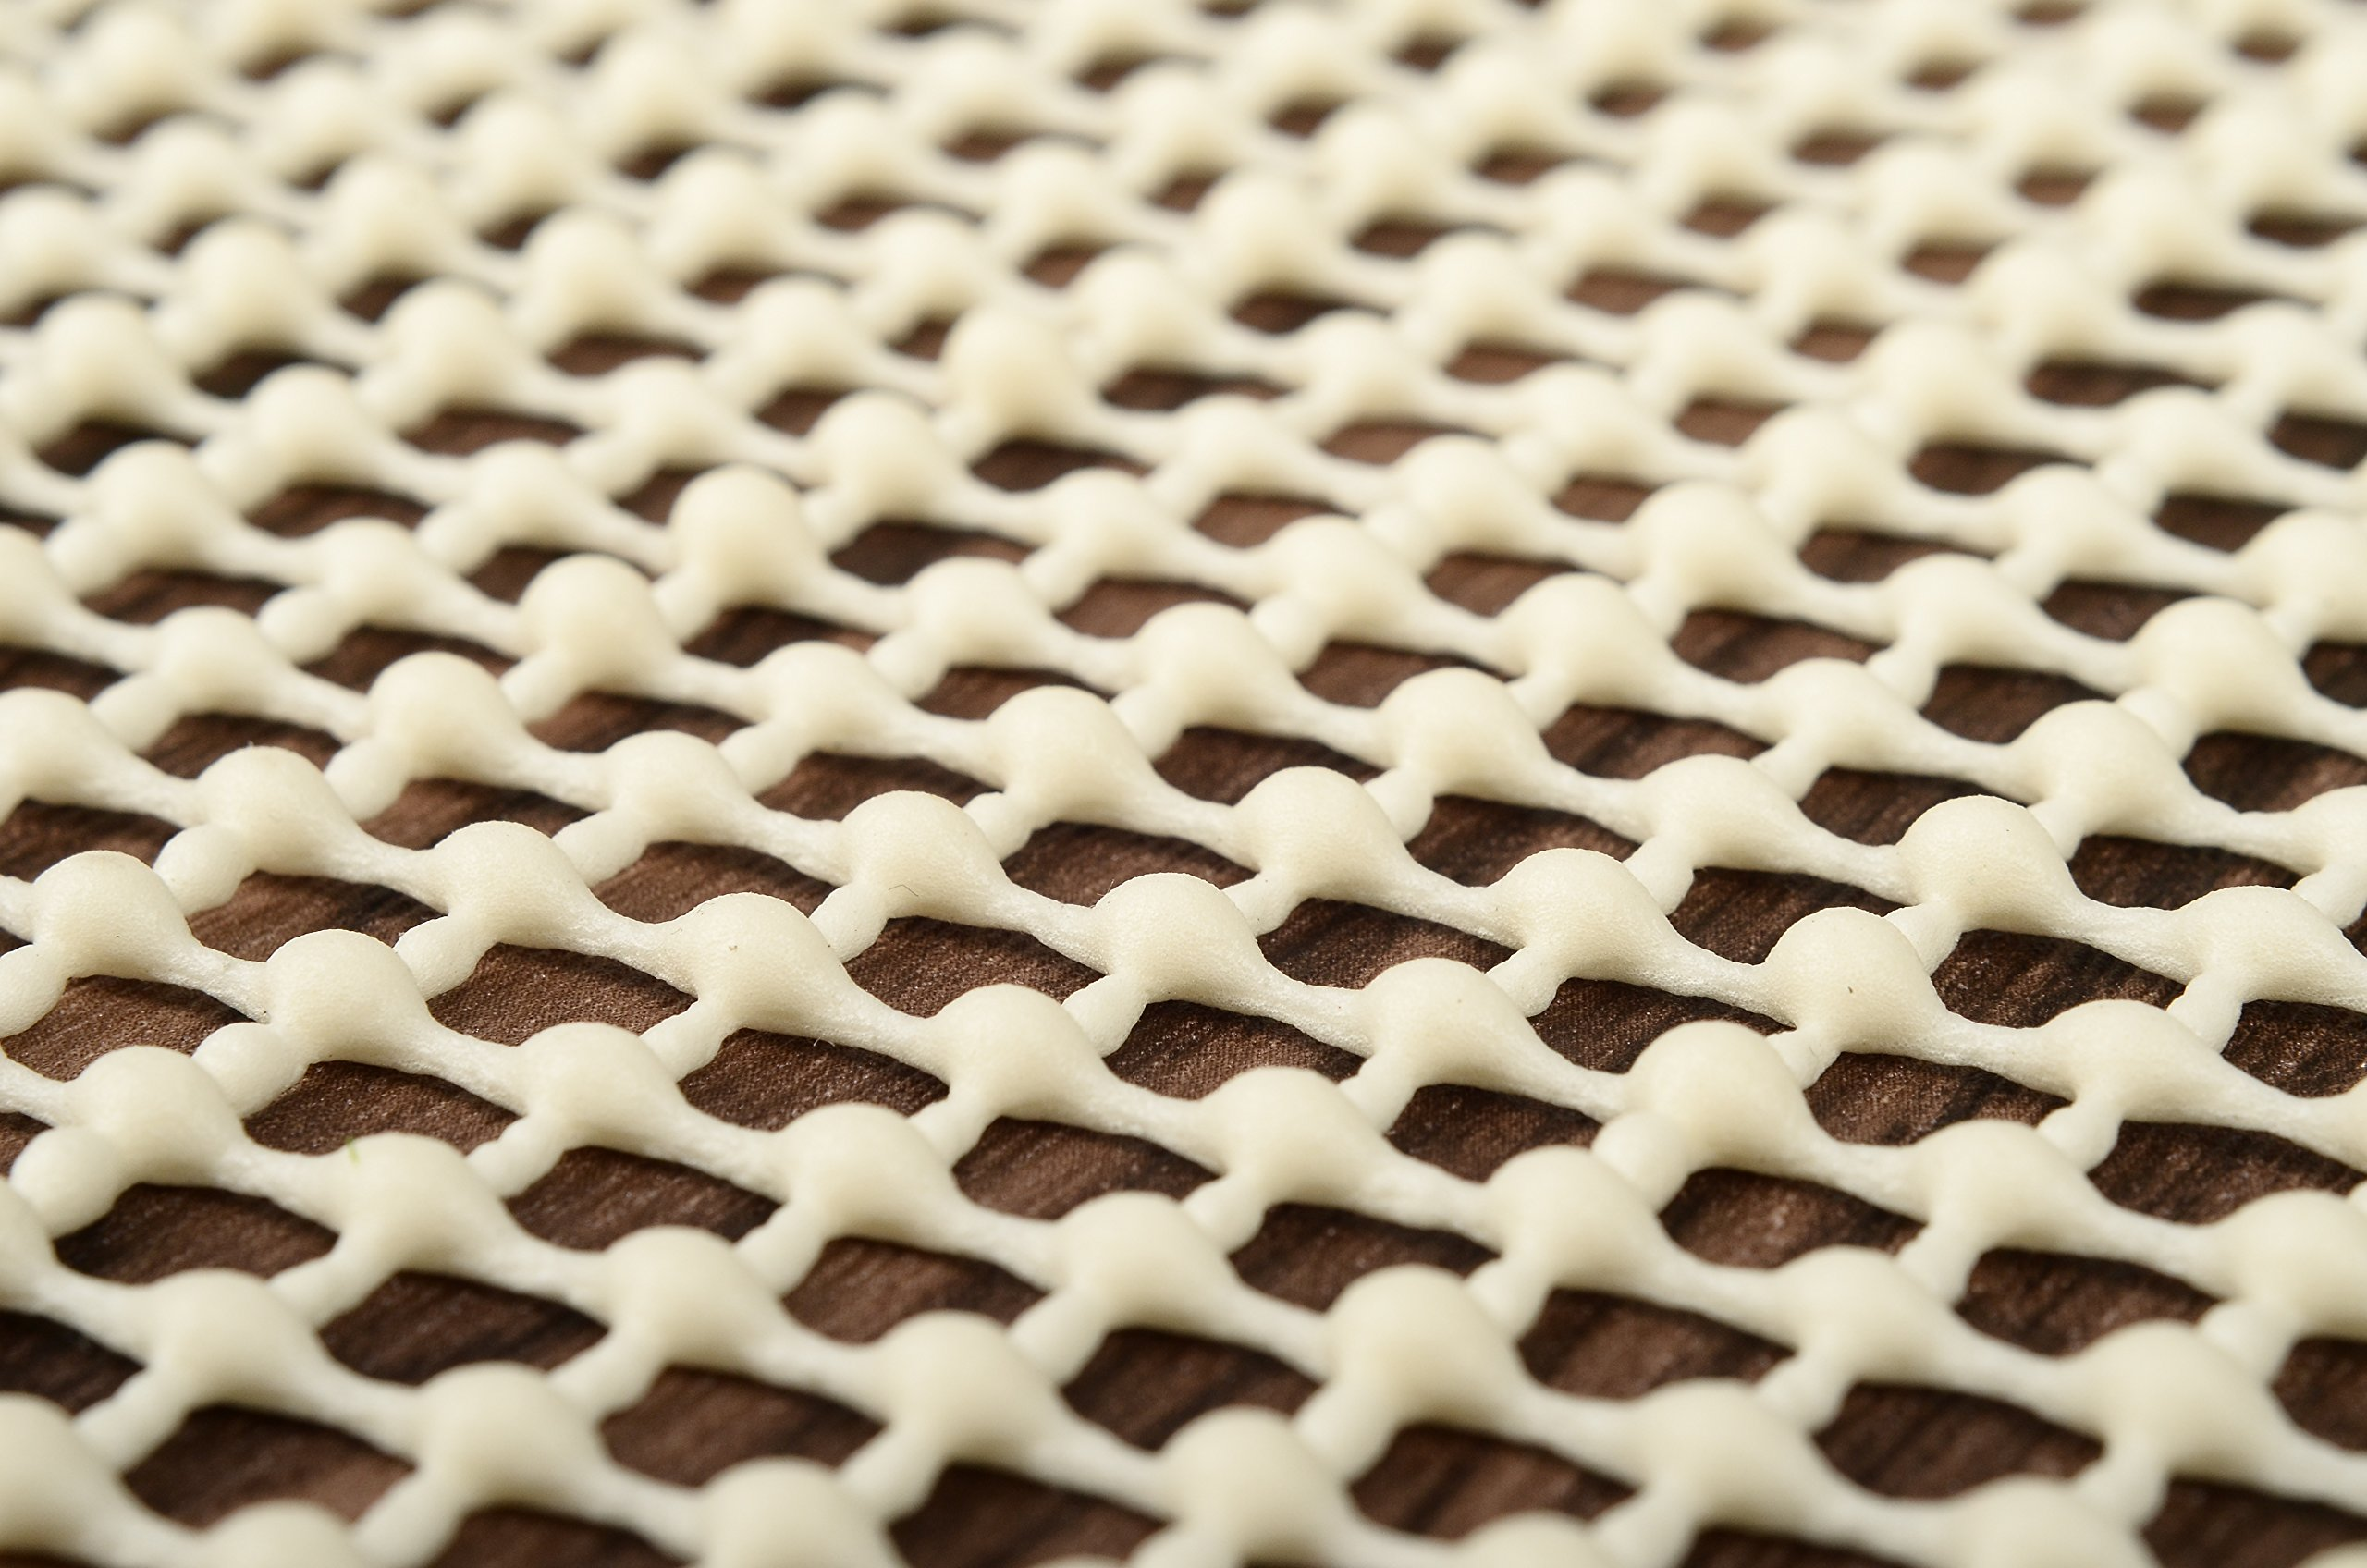 Abahub Anti Slip Rug Pad 8' x 10' for Under Area Rugs Carpets Runners Doormats on Wood Hardwood Floors, Non Slip, Washable Padding Grips by ABAHUB (Image #5)